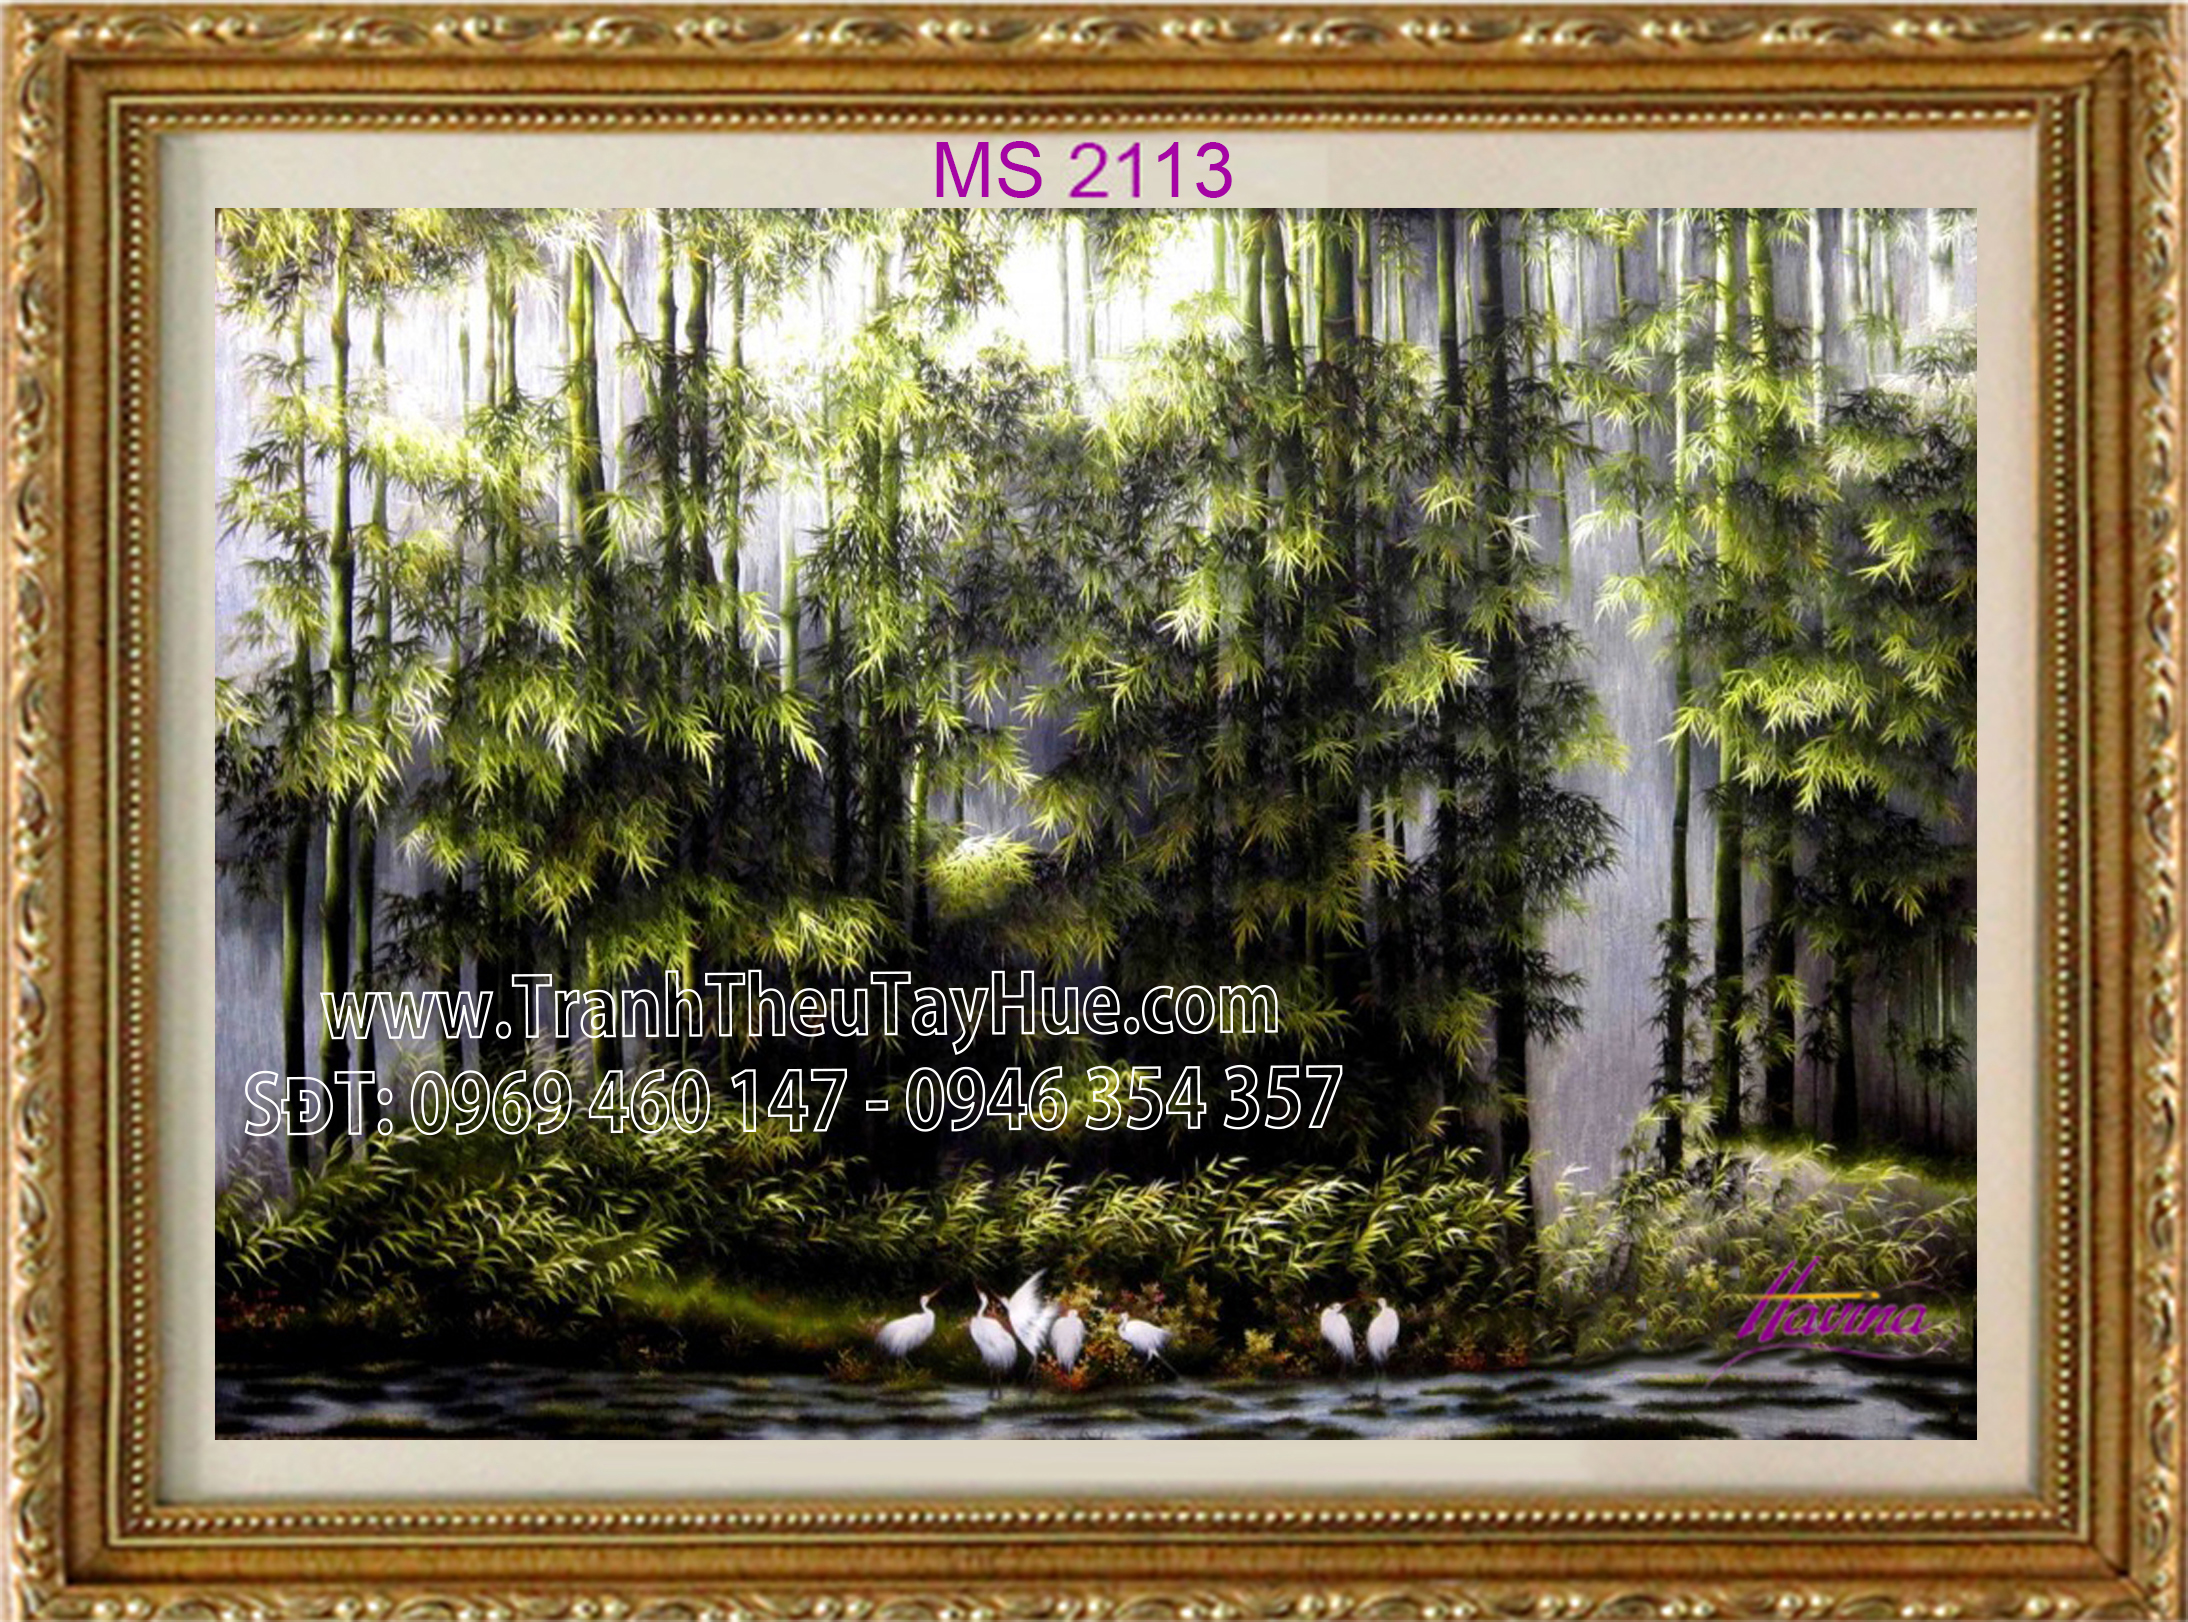 tranh-theu-phong-canh-lang-que-2113